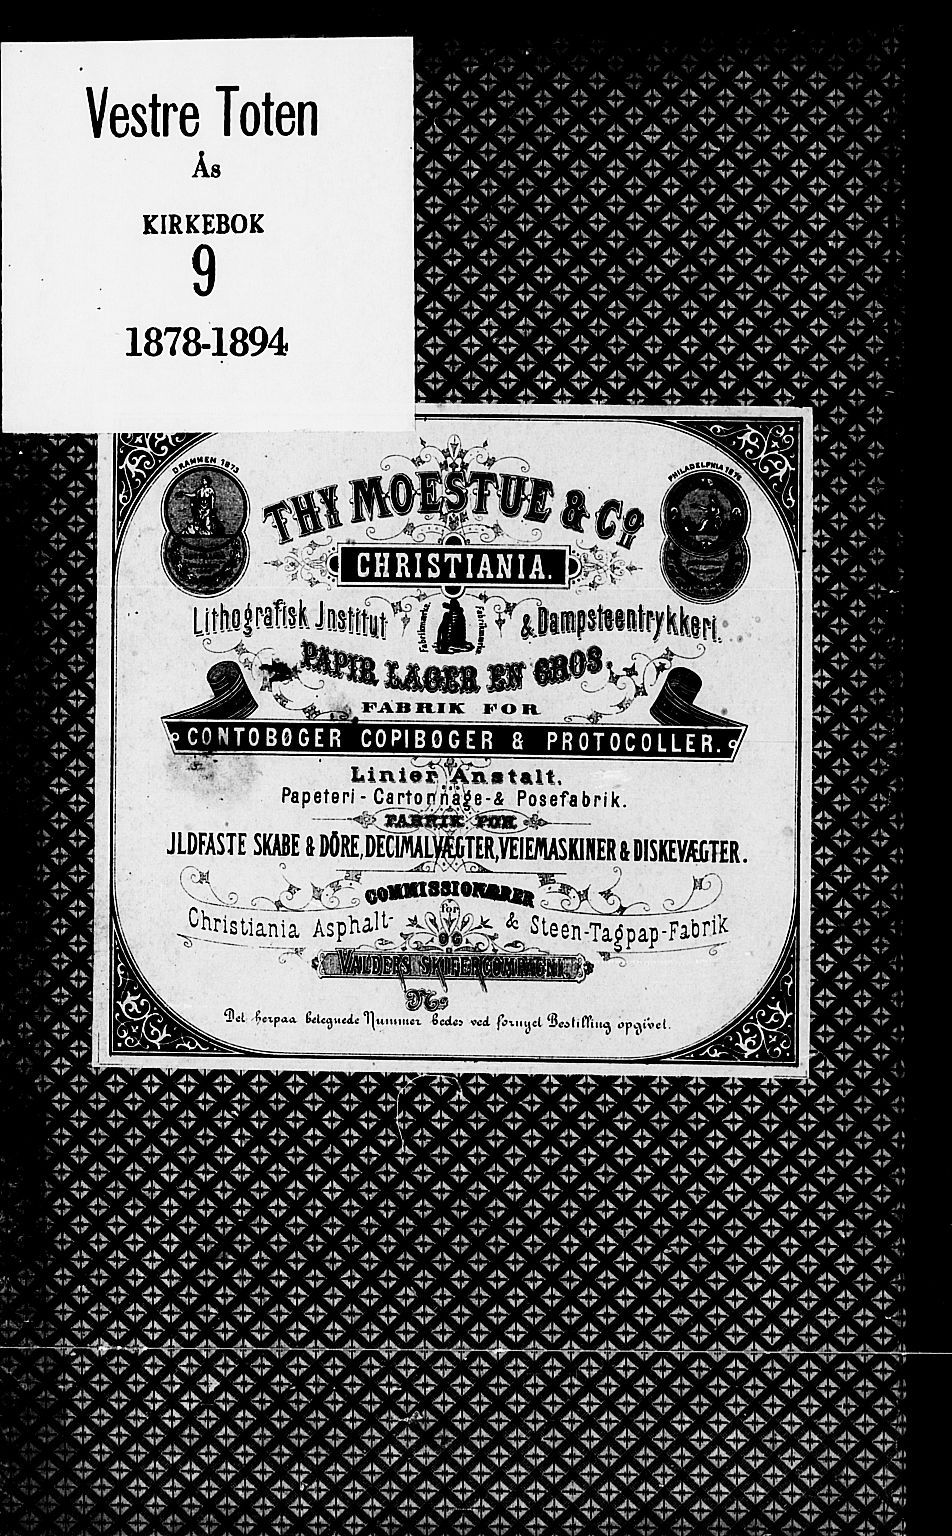 SAH, Vestre Toten prestekontor, Ministerialbok nr. 9, 1878-1894